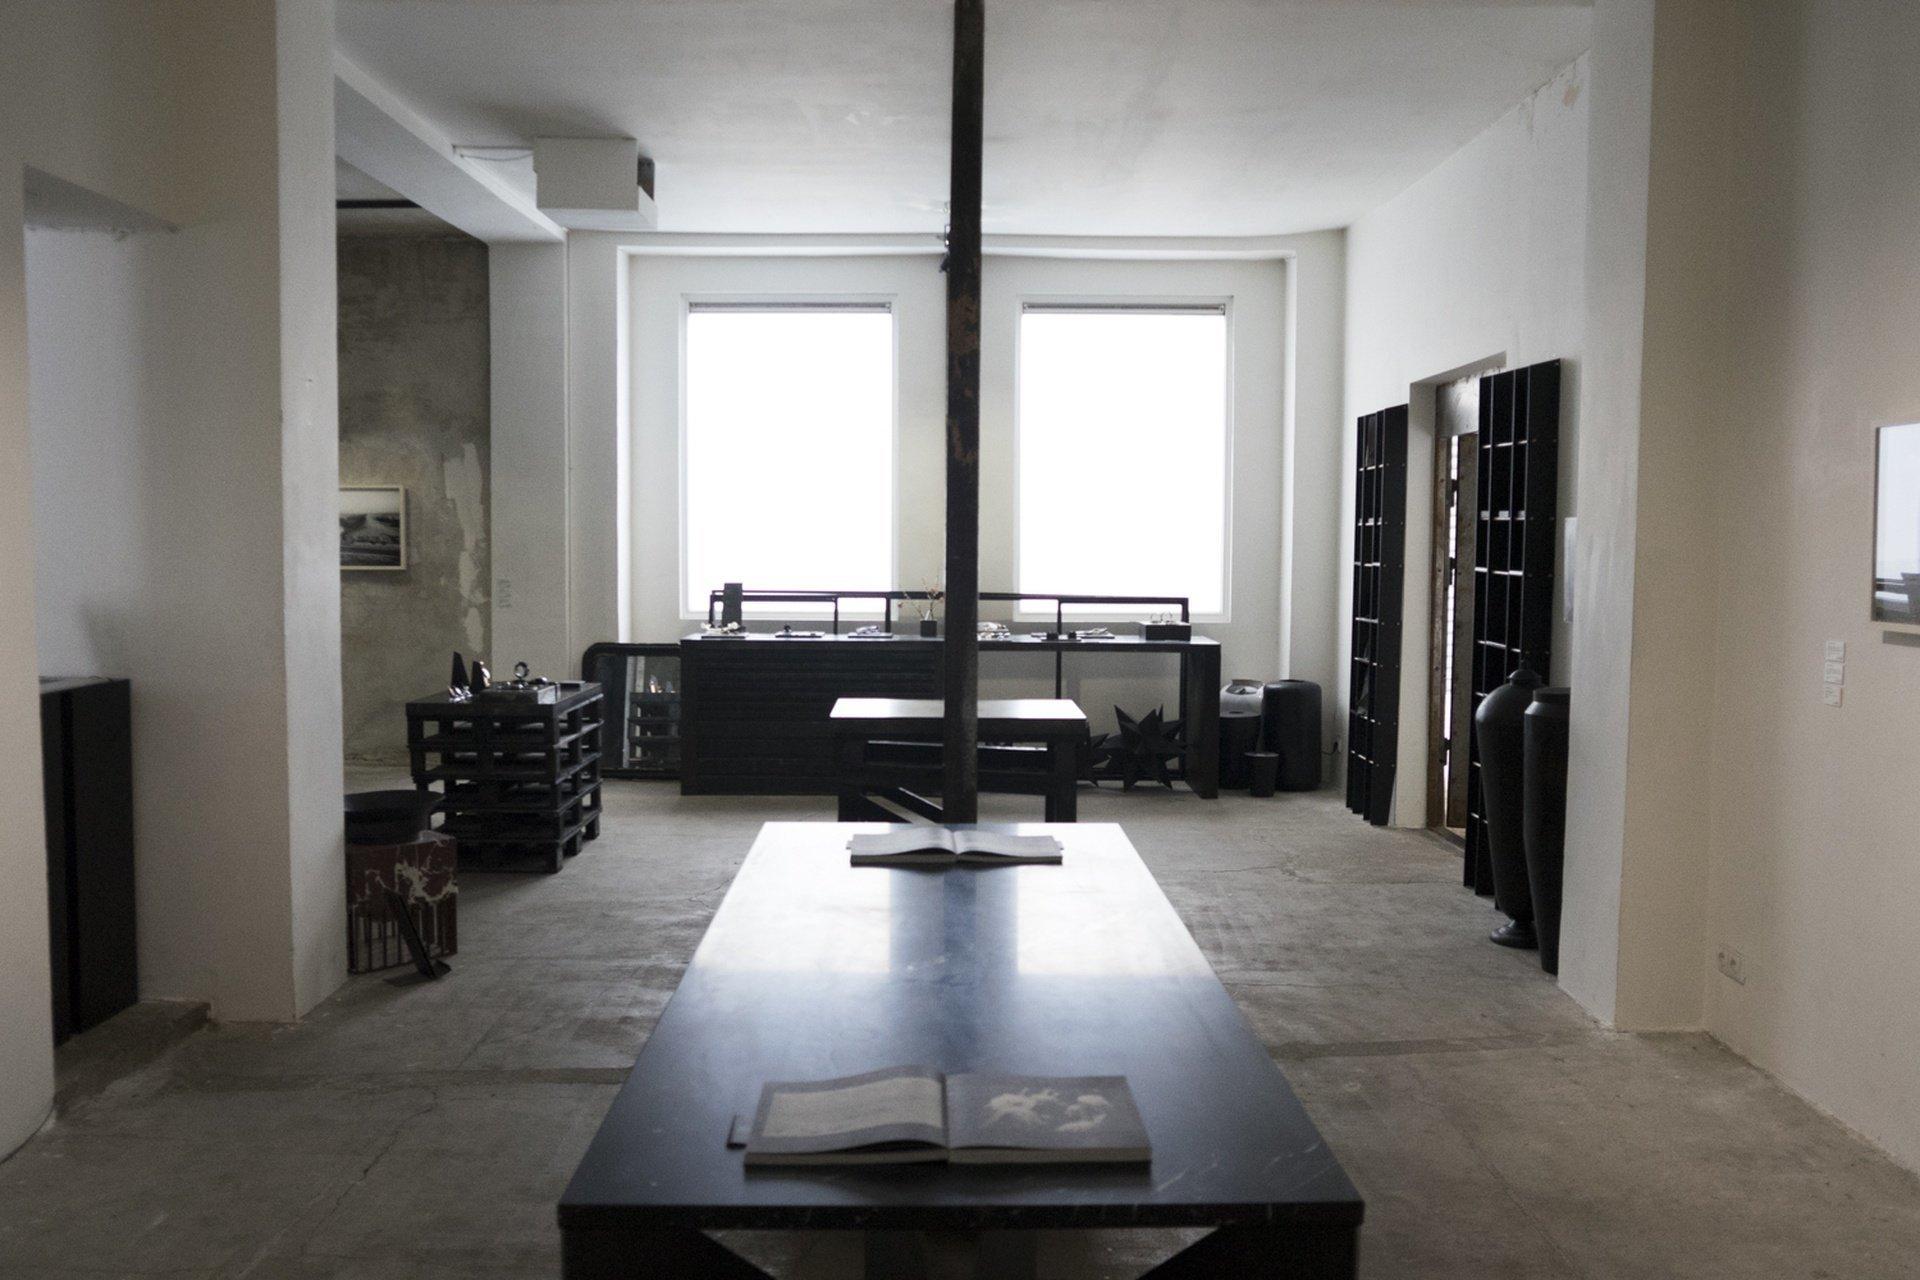 Paris corporate event venues Galerie S/T GALLERY image 0